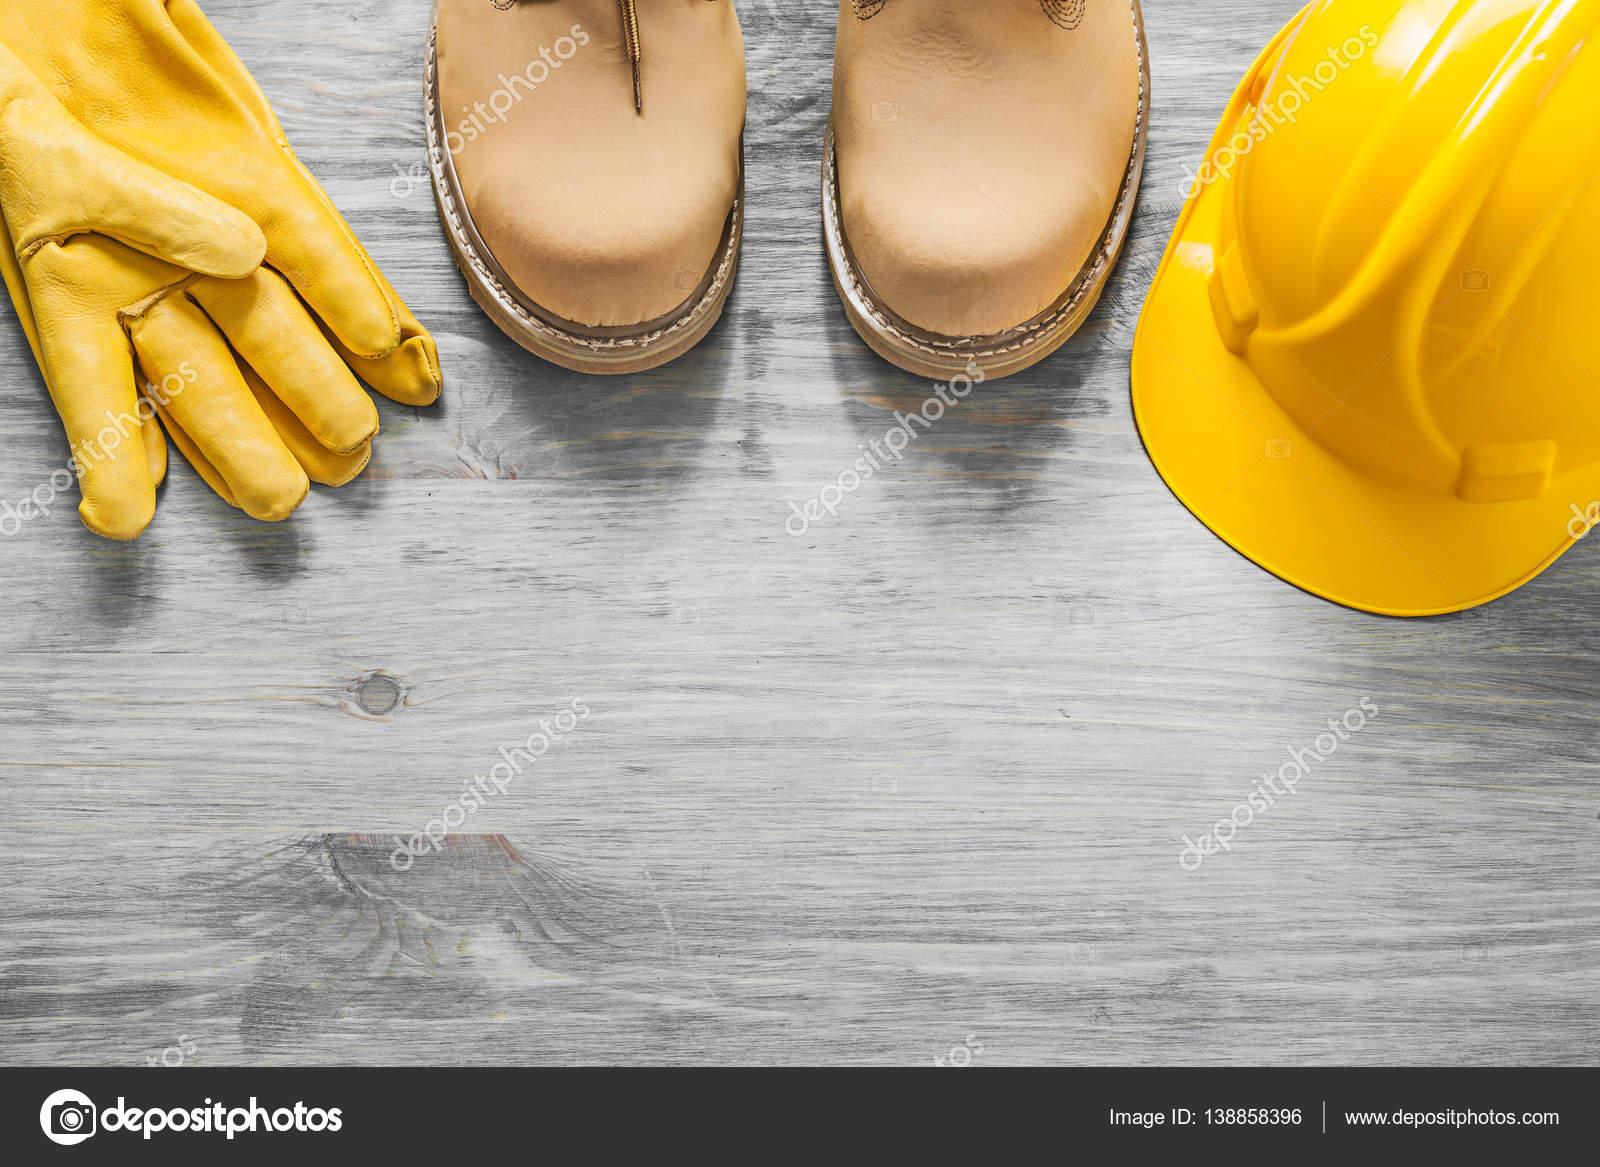 39e814d8c44 Αδιάβροχο lace μπότες κράνος γάντια προστασίας με βάση ξύλινη σανίδα  κατασκευαστική αντίληψη — Εικόνα από mihalec